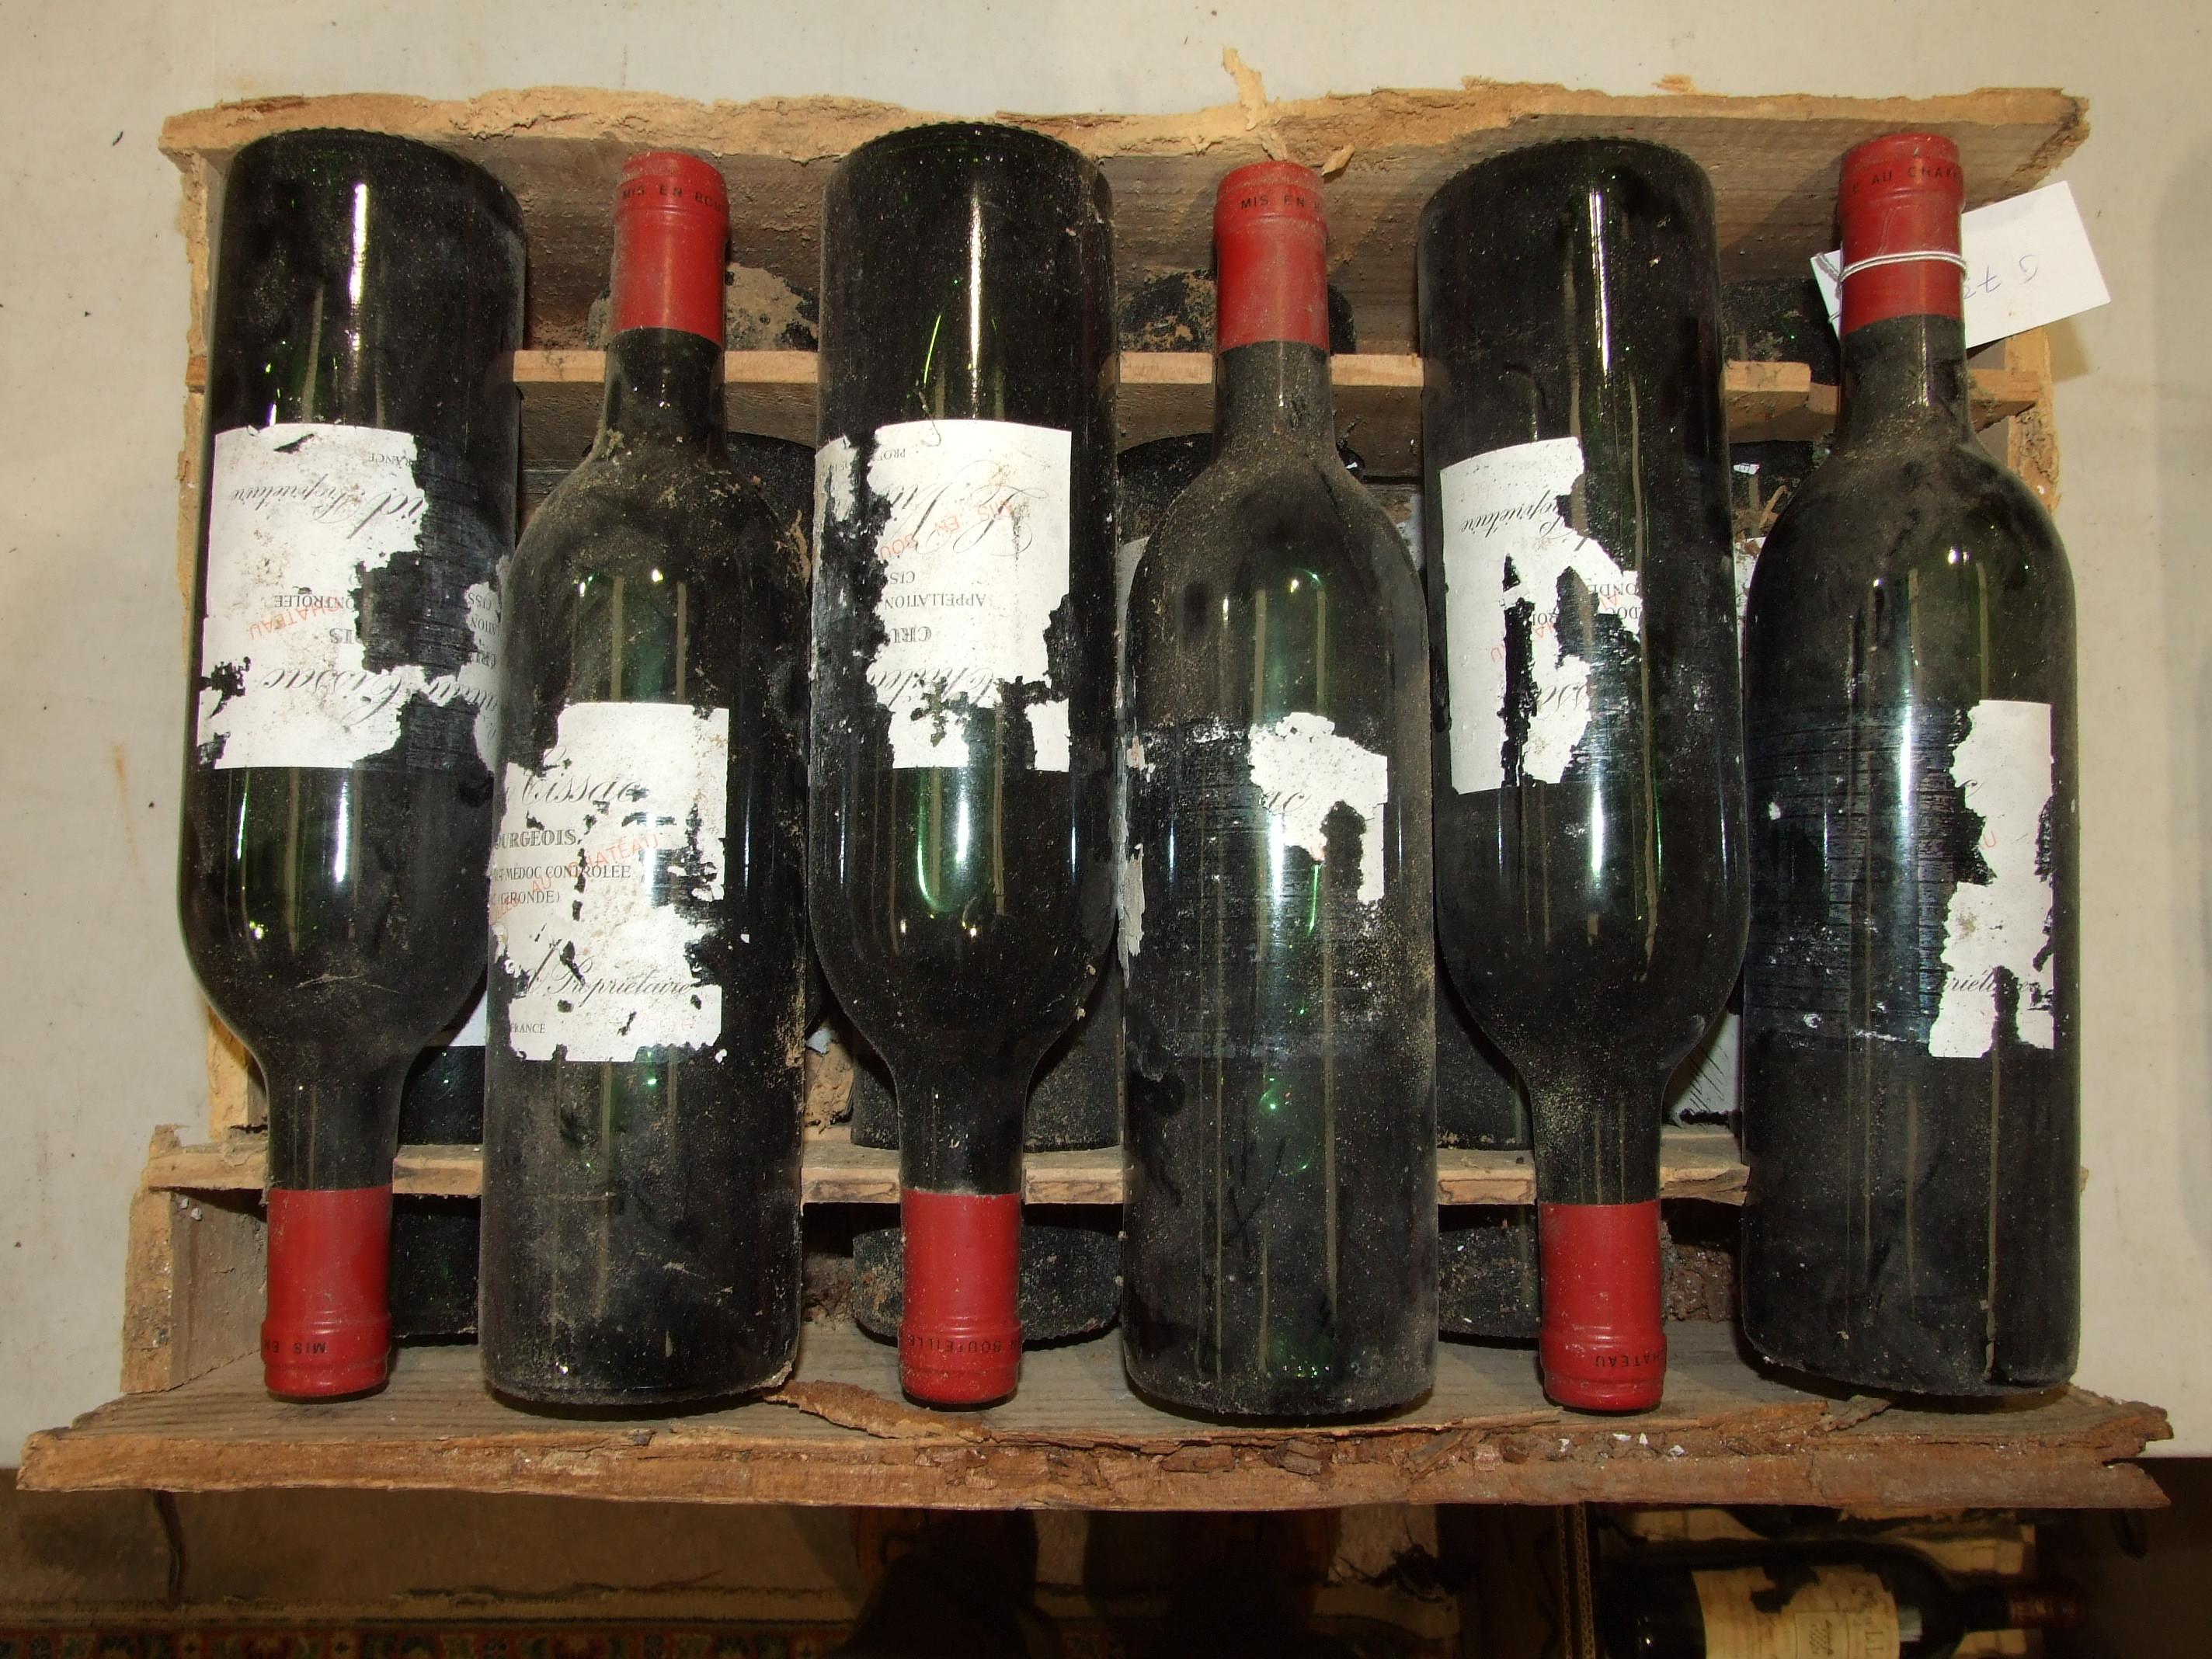 Lot 6 - France, Chateau Cissac Haut Medoc Cru Bourgeois 1984, high shoulder, OWC (damaged), all labels